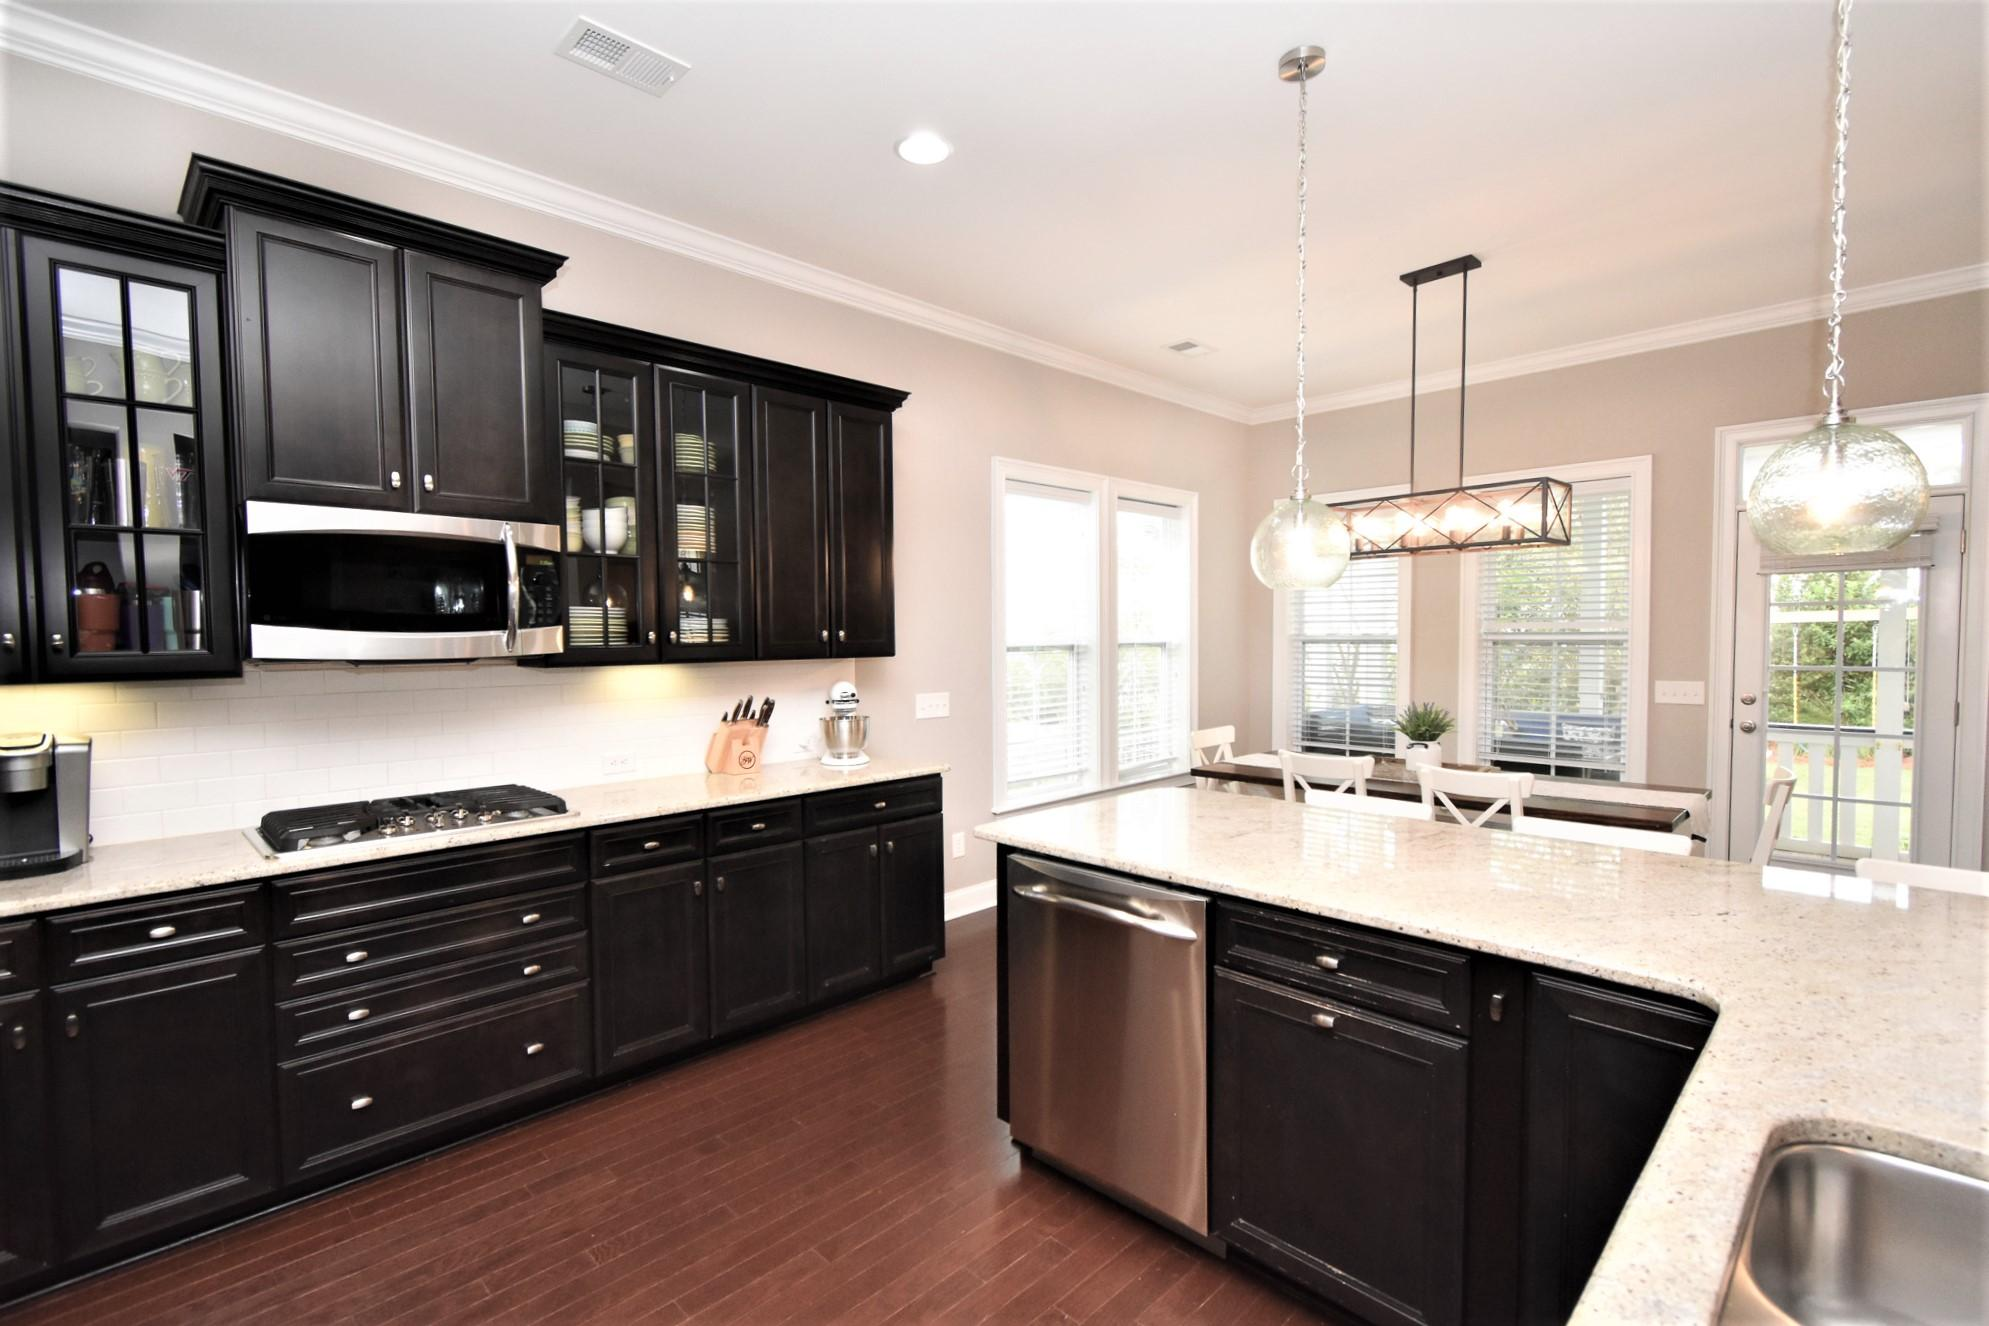 Carolina Park Homes For Sale - 1480 Croaton, Mount Pleasant, SC - 24